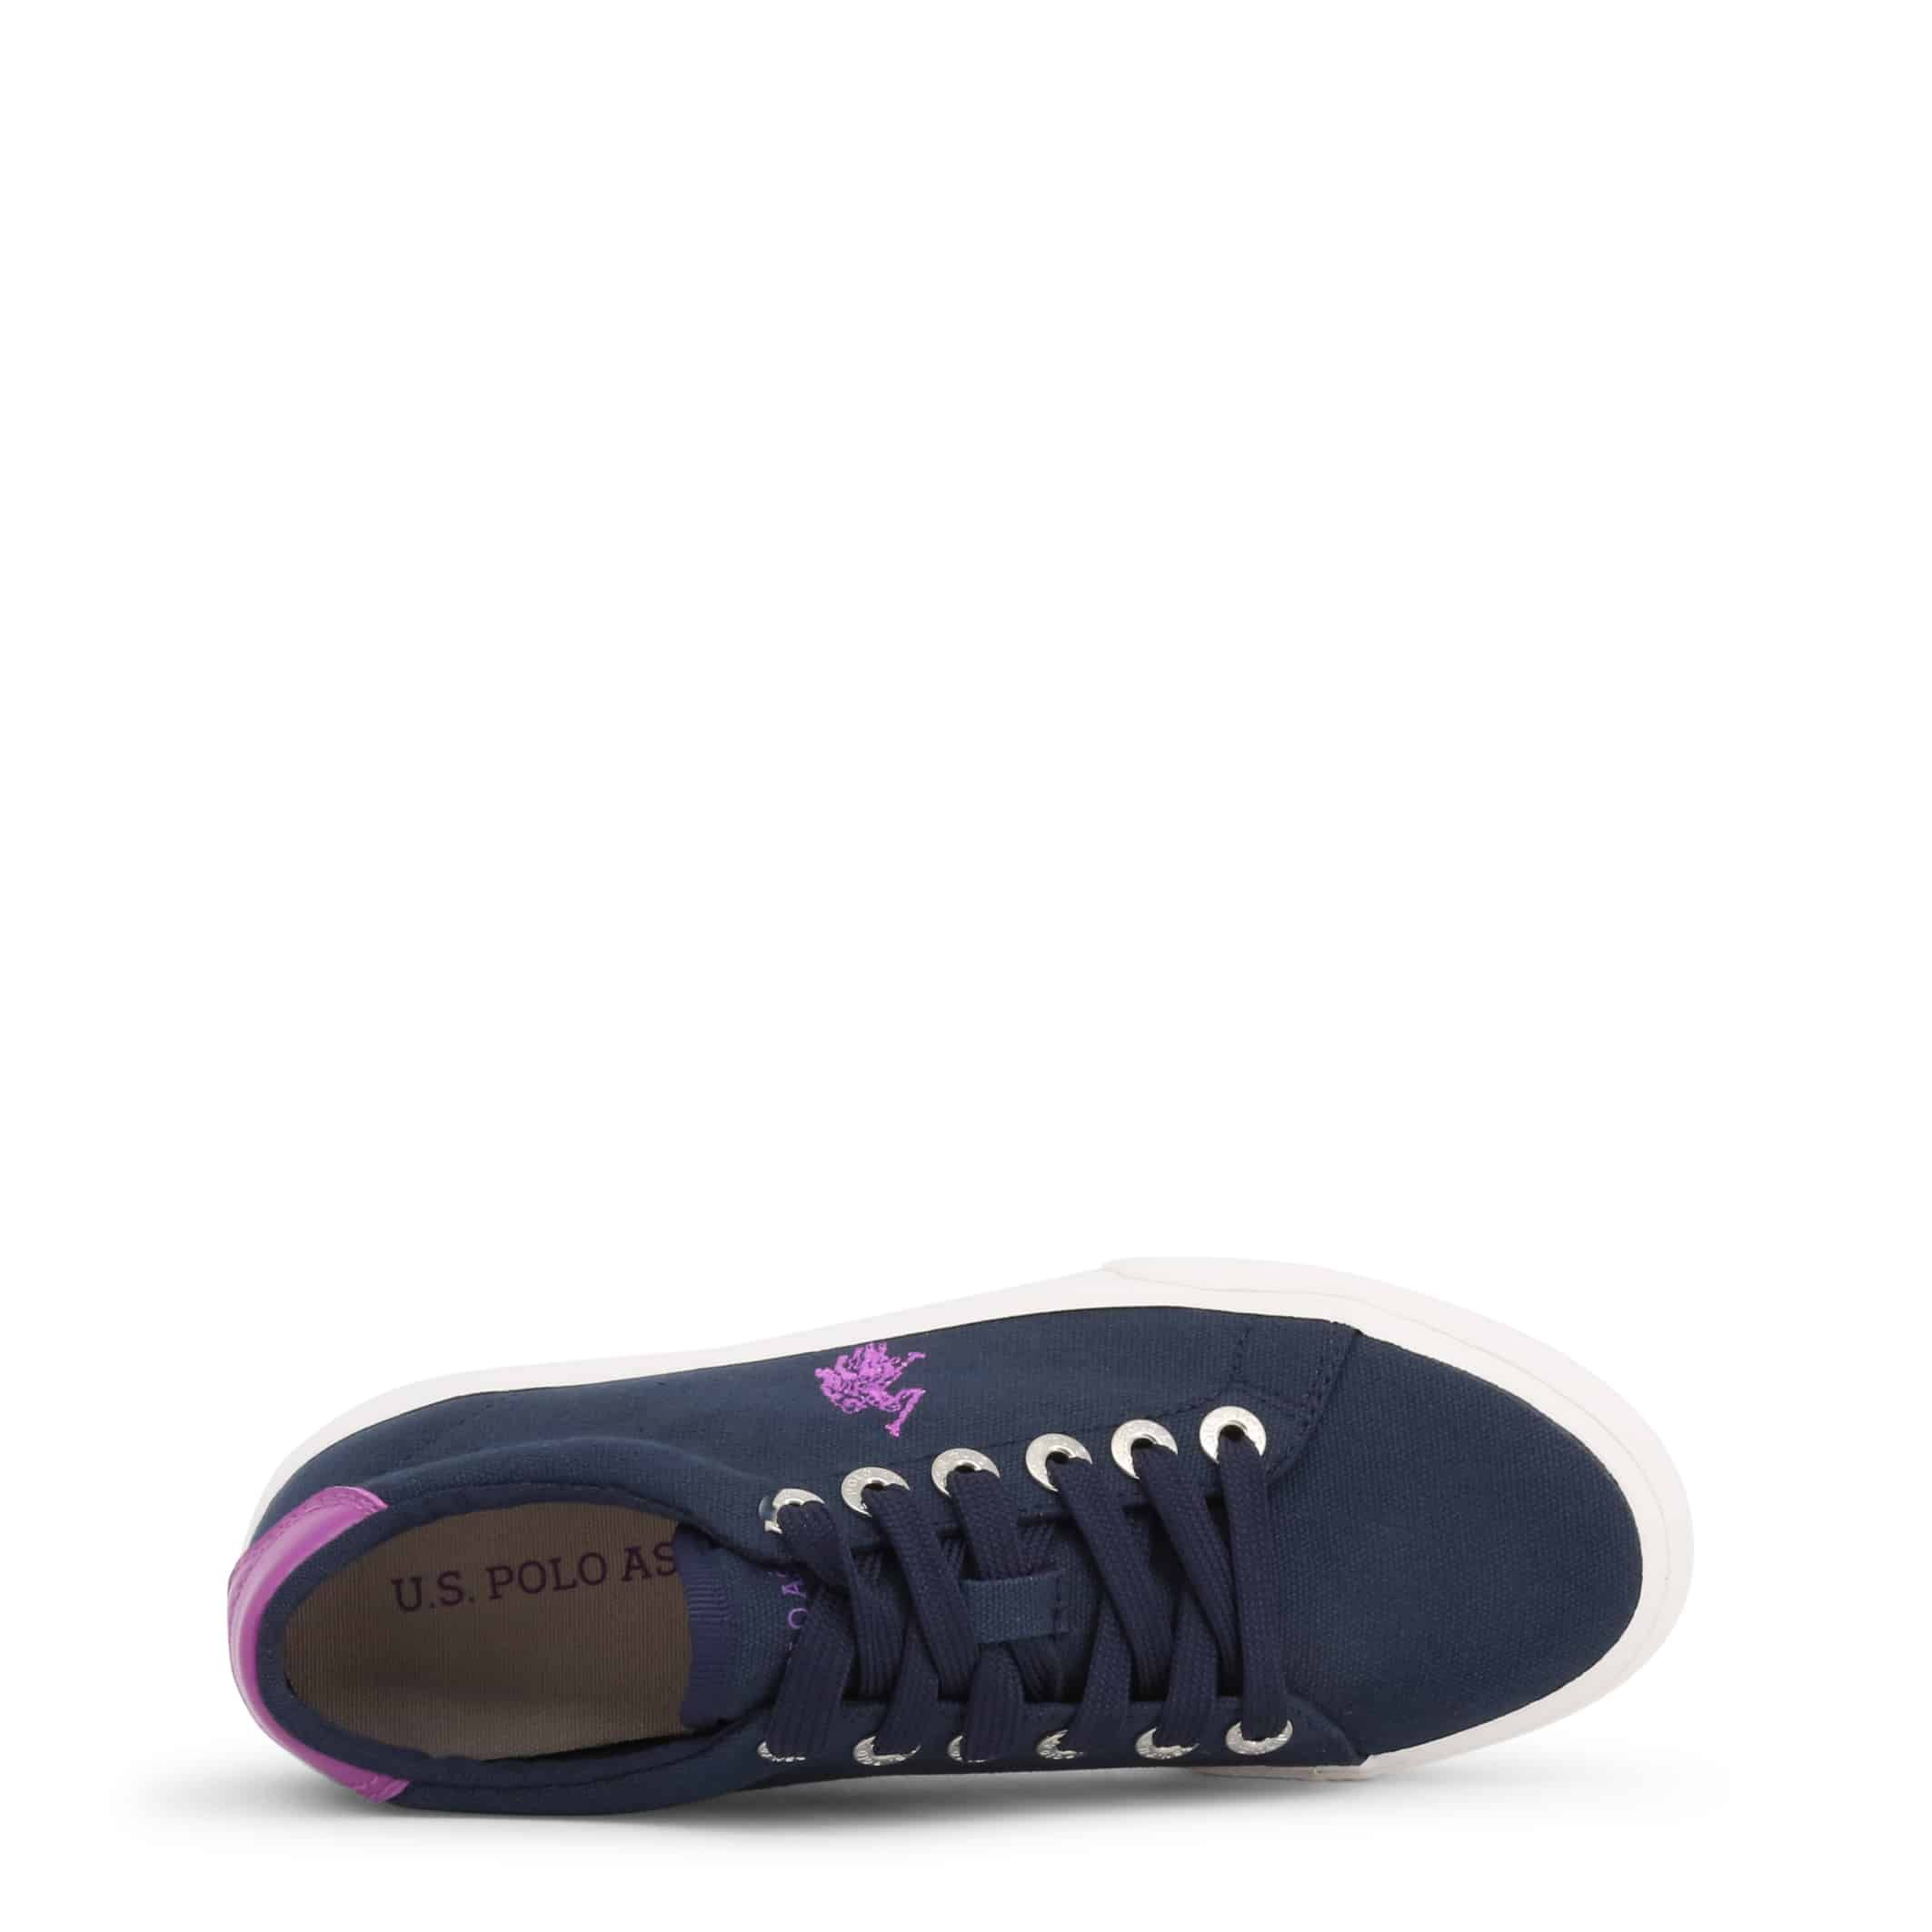 Schuhe U.S. Polo Assn. – MAREW4262S0_CY1 – Blau